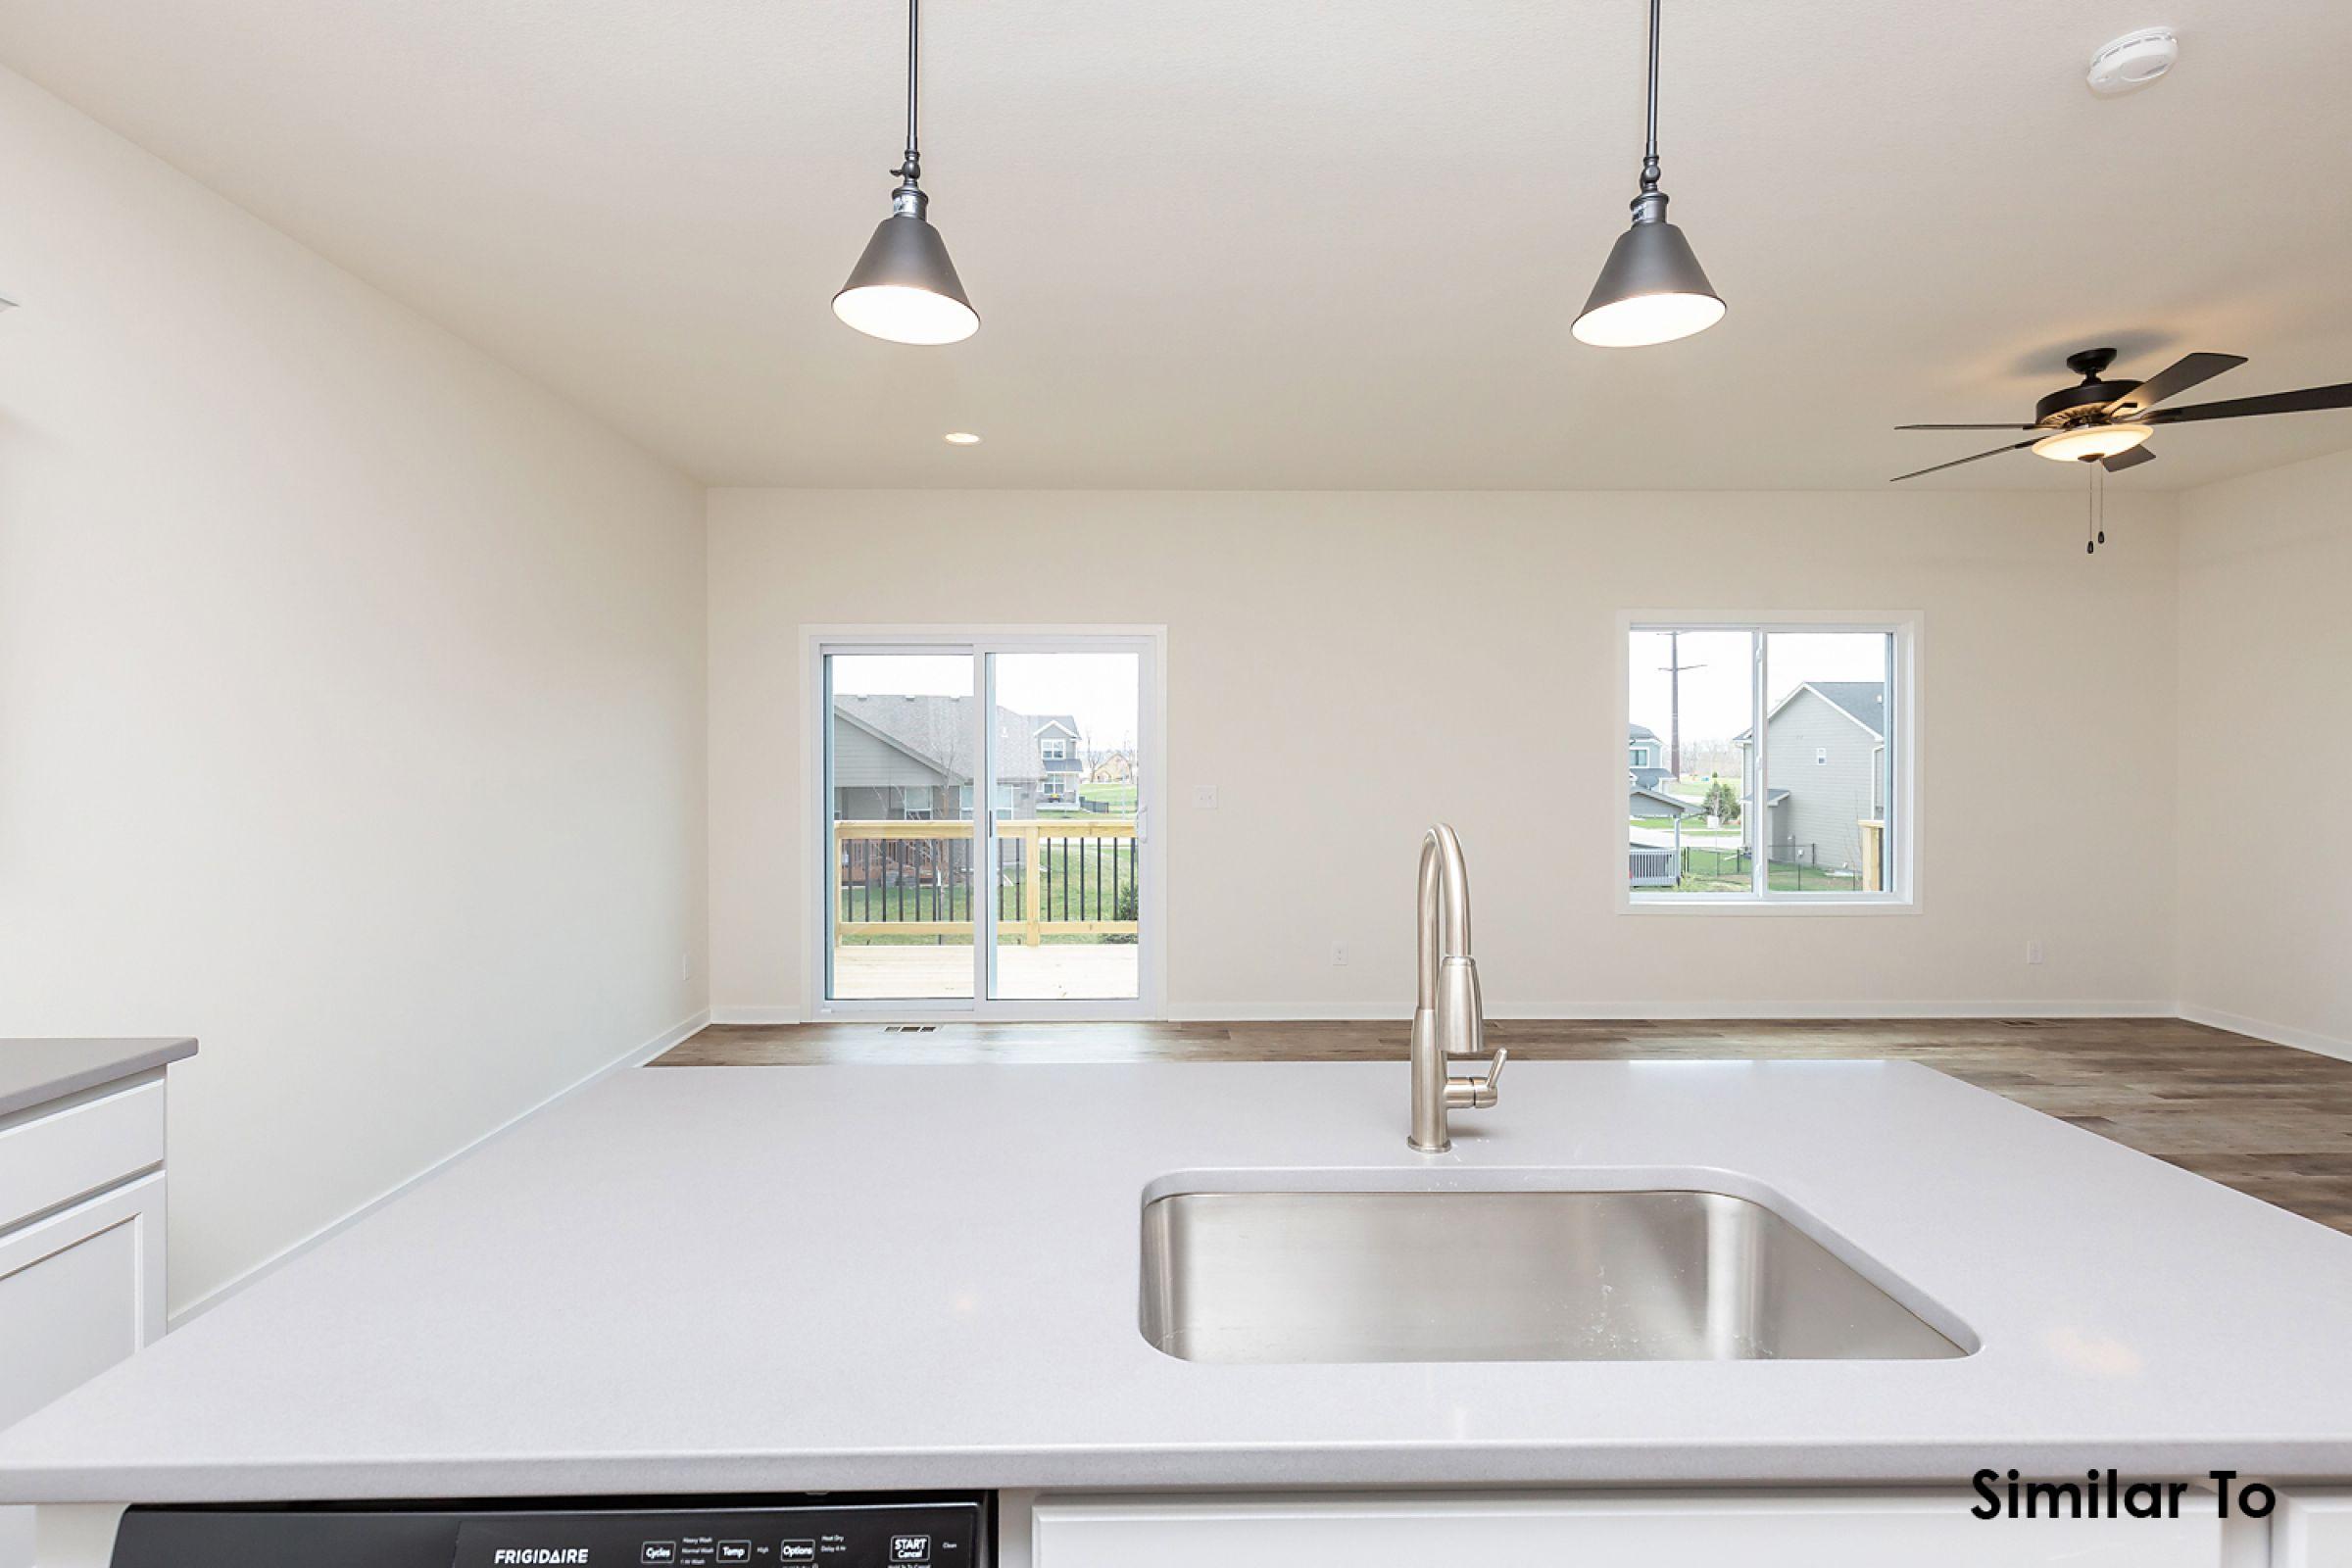 residential-warren-county-iowa-0-acres-listing-number-15134-6-2020-08-27-185024.jpg